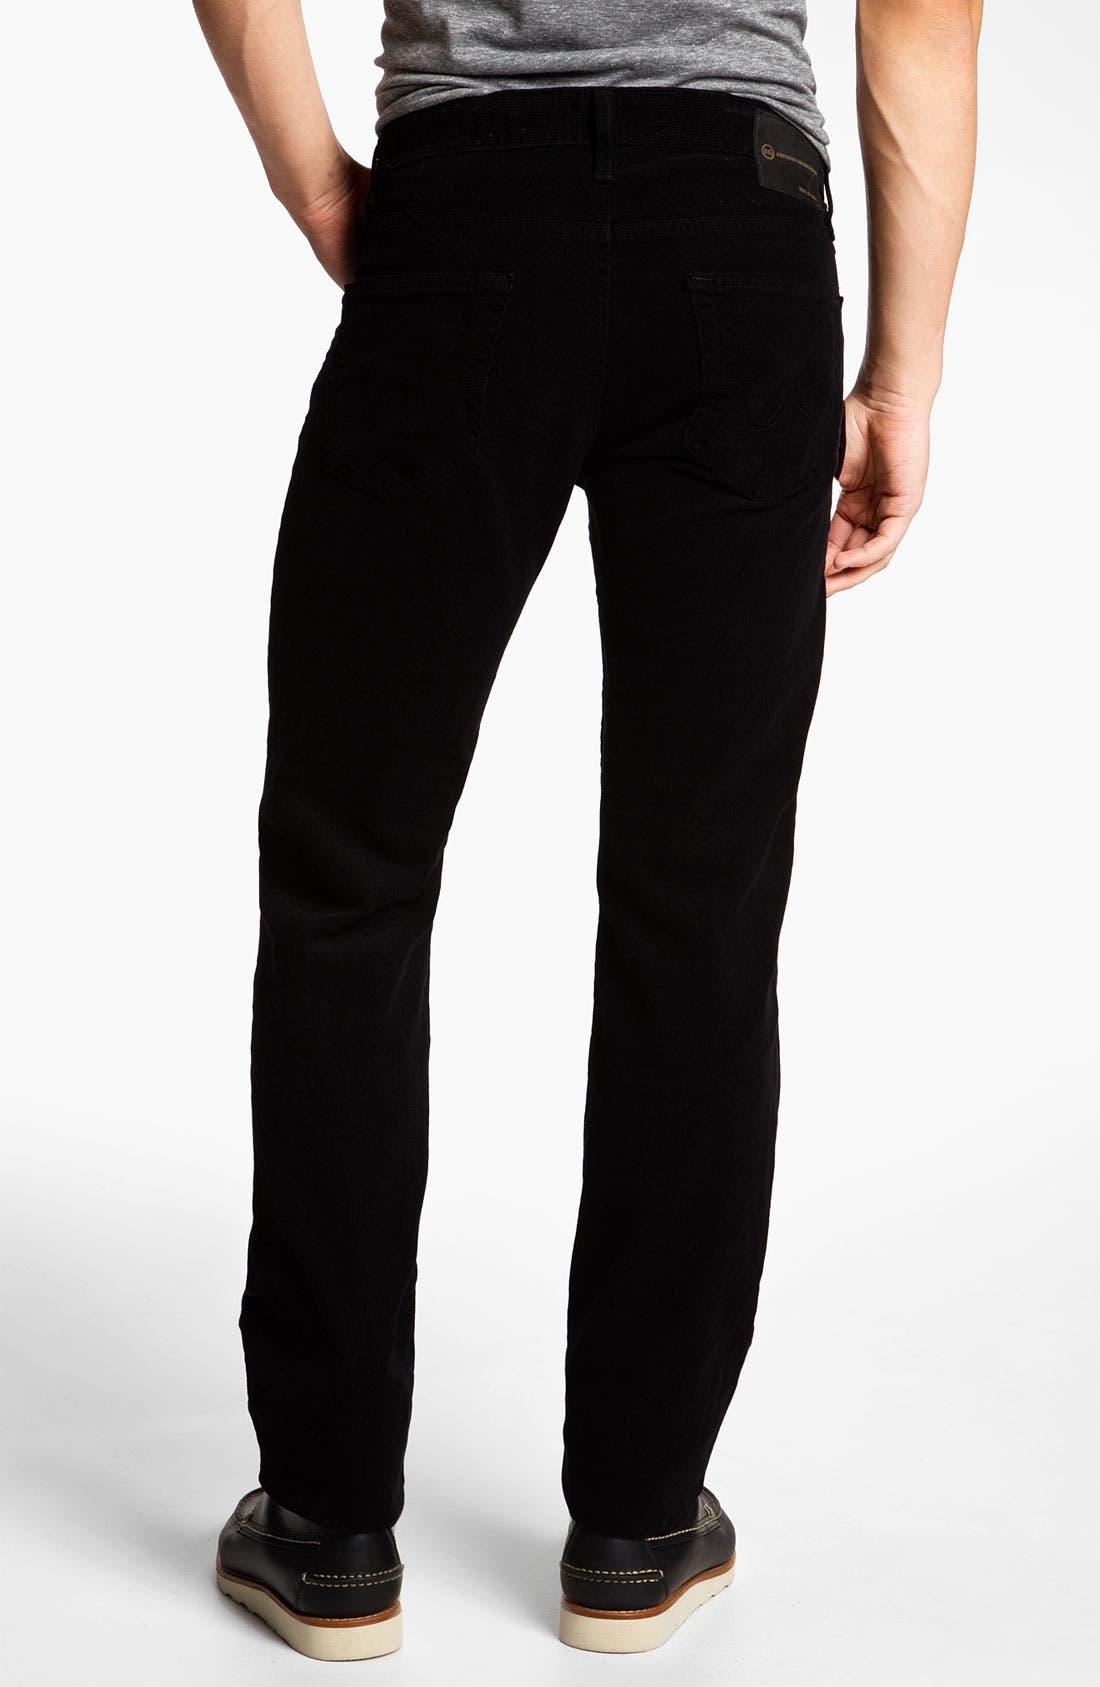 Jeans 'Matchbox' Slim Straight Leg Corduroy Pants,                             Alternate thumbnail 3, color,                             010